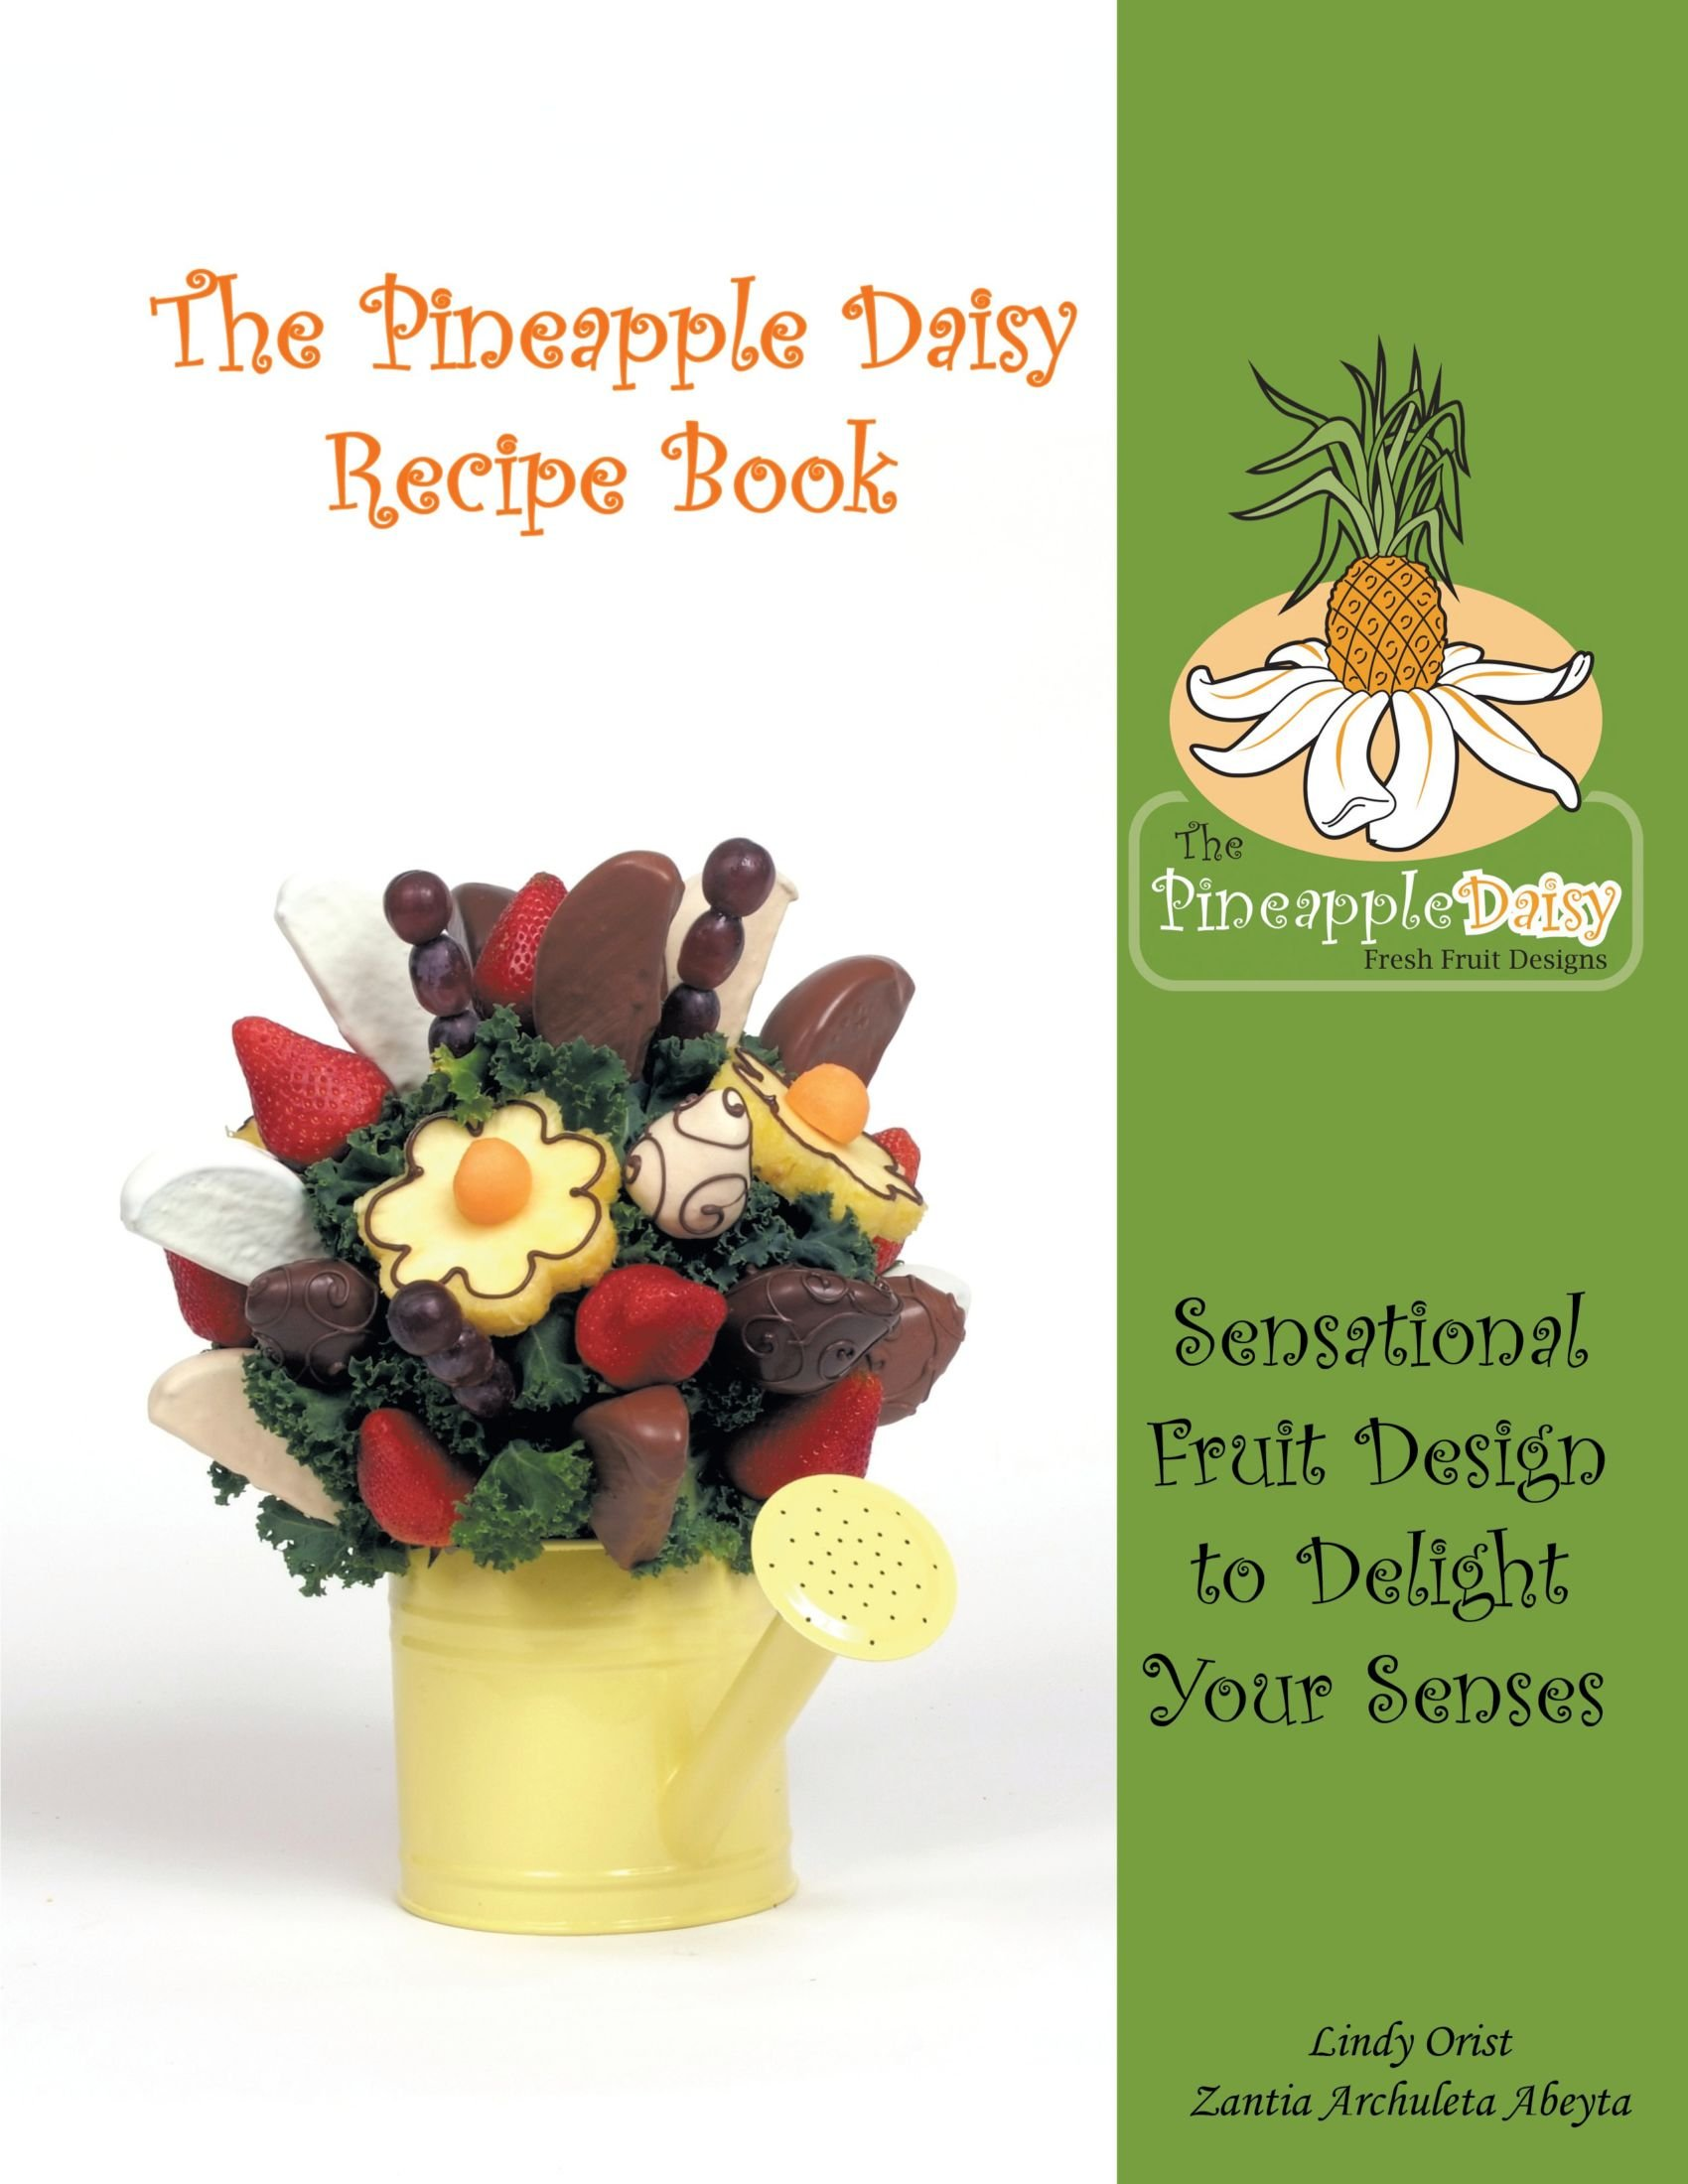 The pineapple daisy recipe book sensational fruit design to delight the pineapple daisy recipe book sensational fruit design to delight your senses lindy orist zantia archuleta abeyta 9781438961675 amazon books izmirmasajfo